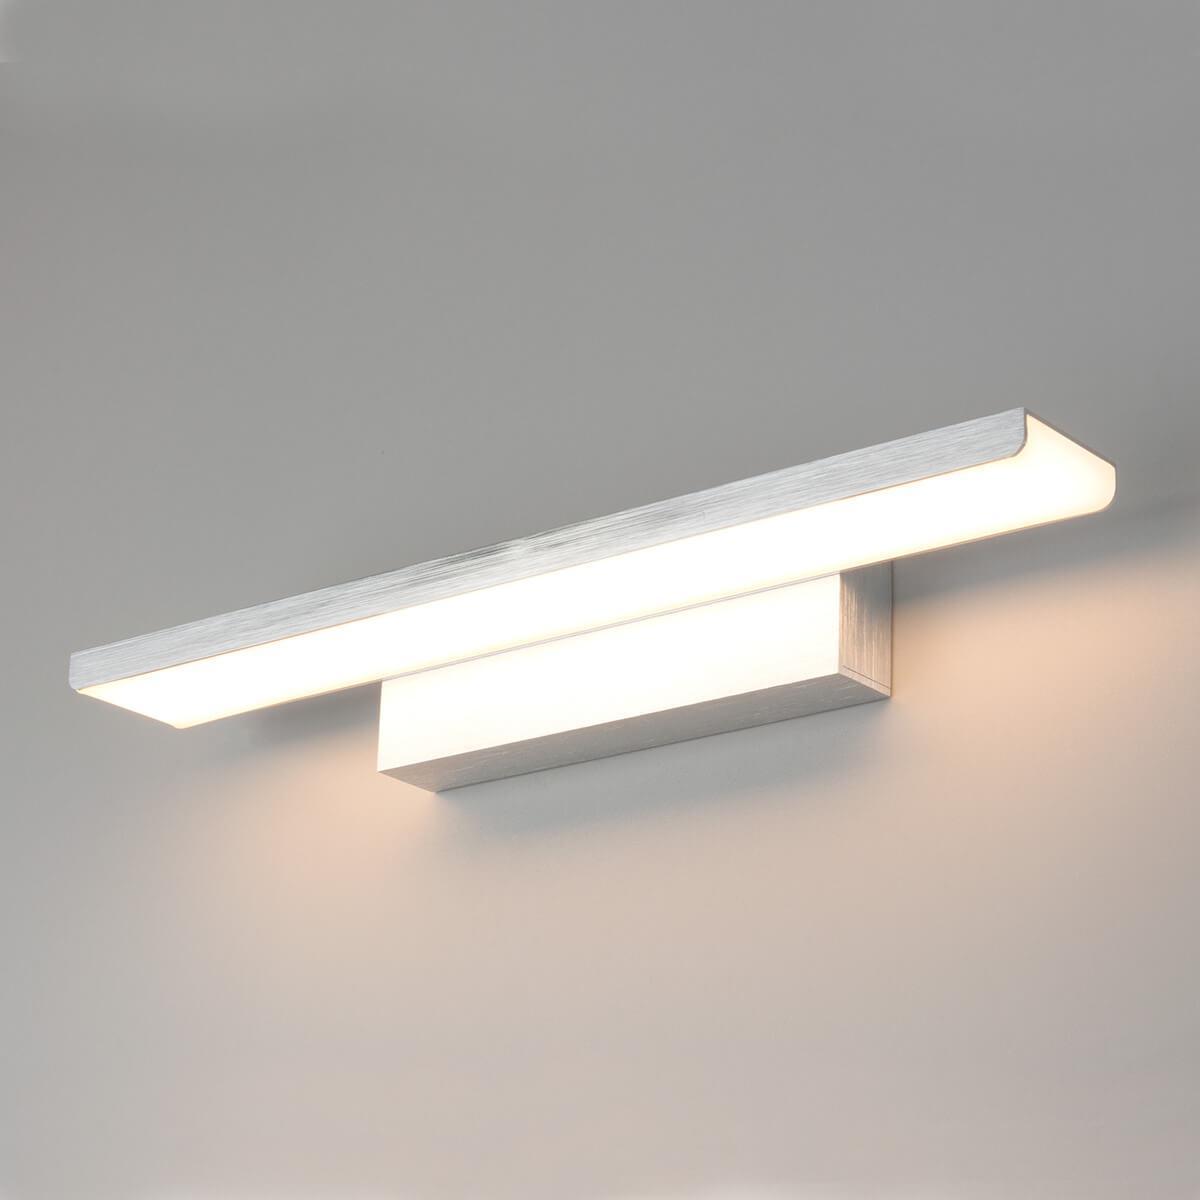 Подсветка для картин Elektrostandard 4690389102806, LED, 16 Вт подсветка для картин elektrostandard sankara led 16w 1009 ip20 черная 4690389102790